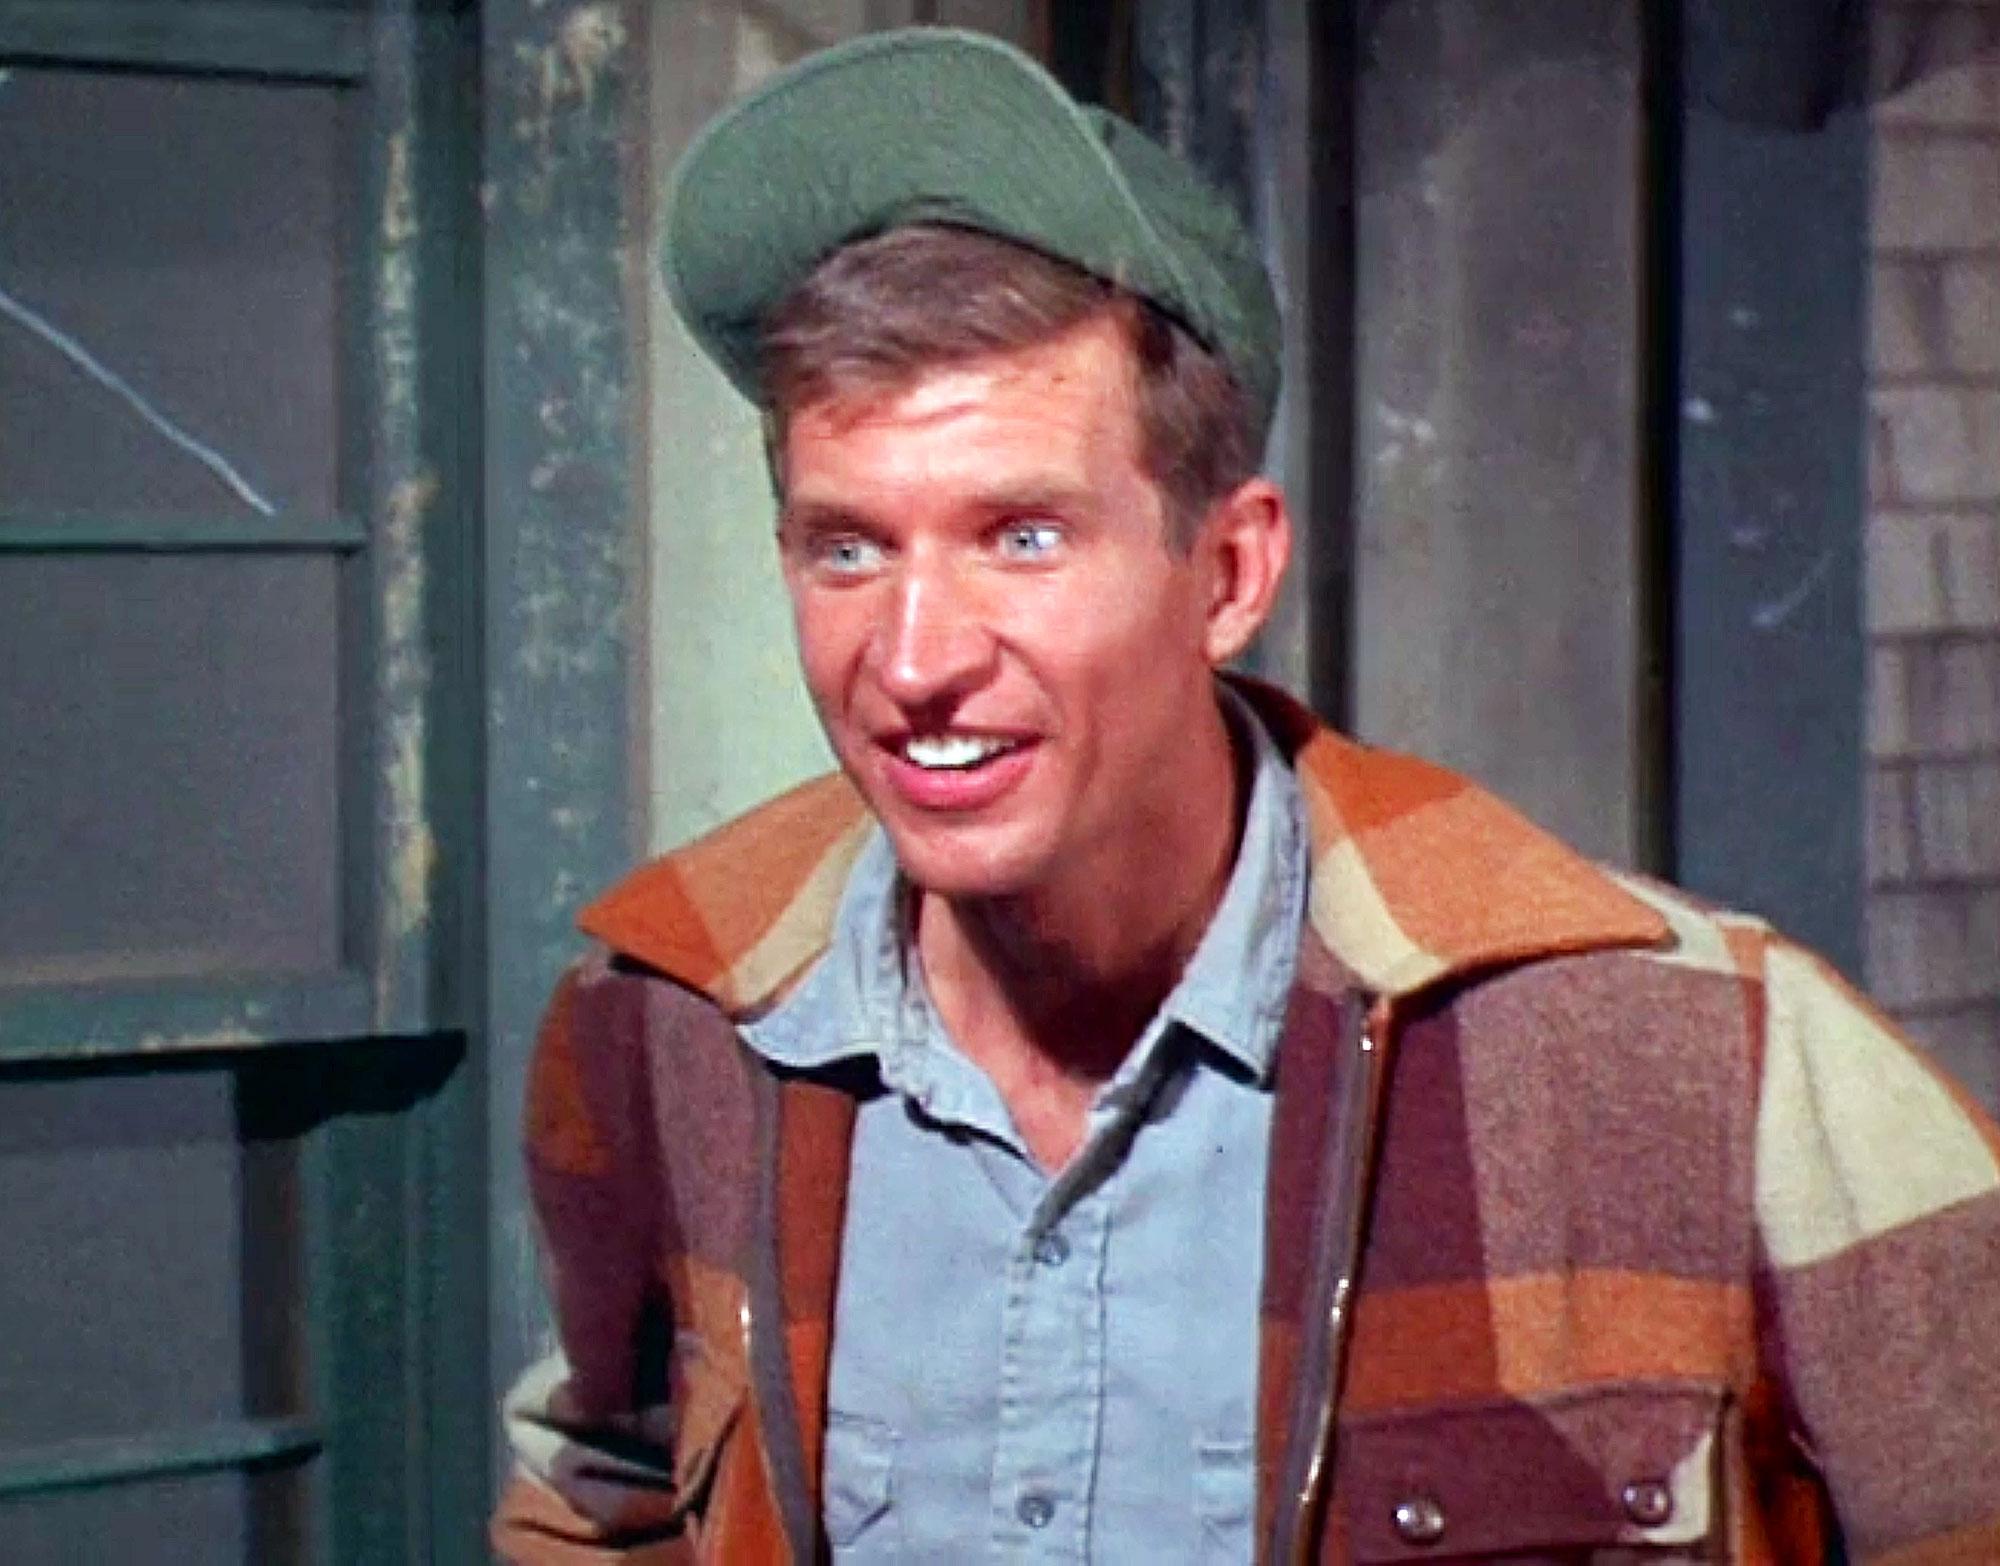 Green Acres Star Tom Lester Dead at 81